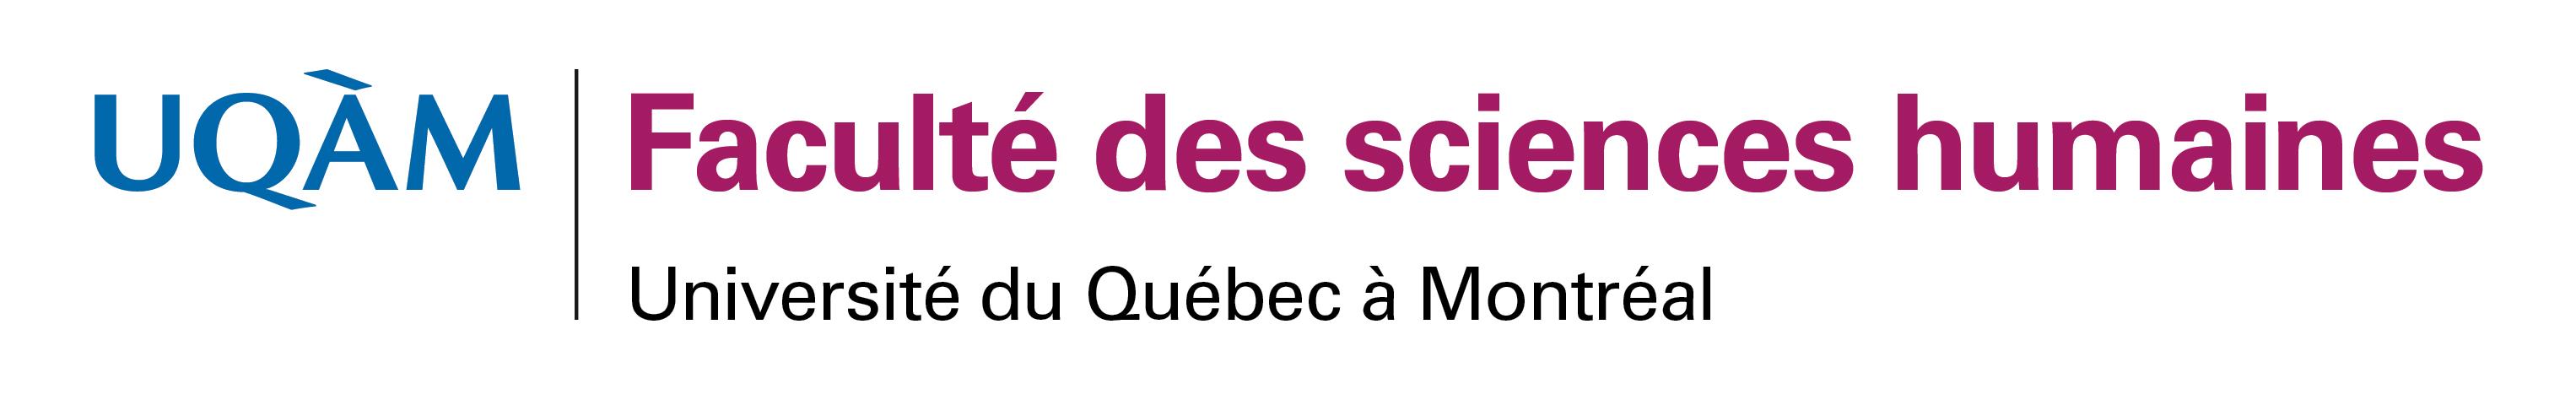 lg_Faculte-sciences-humaines-externe-COUL